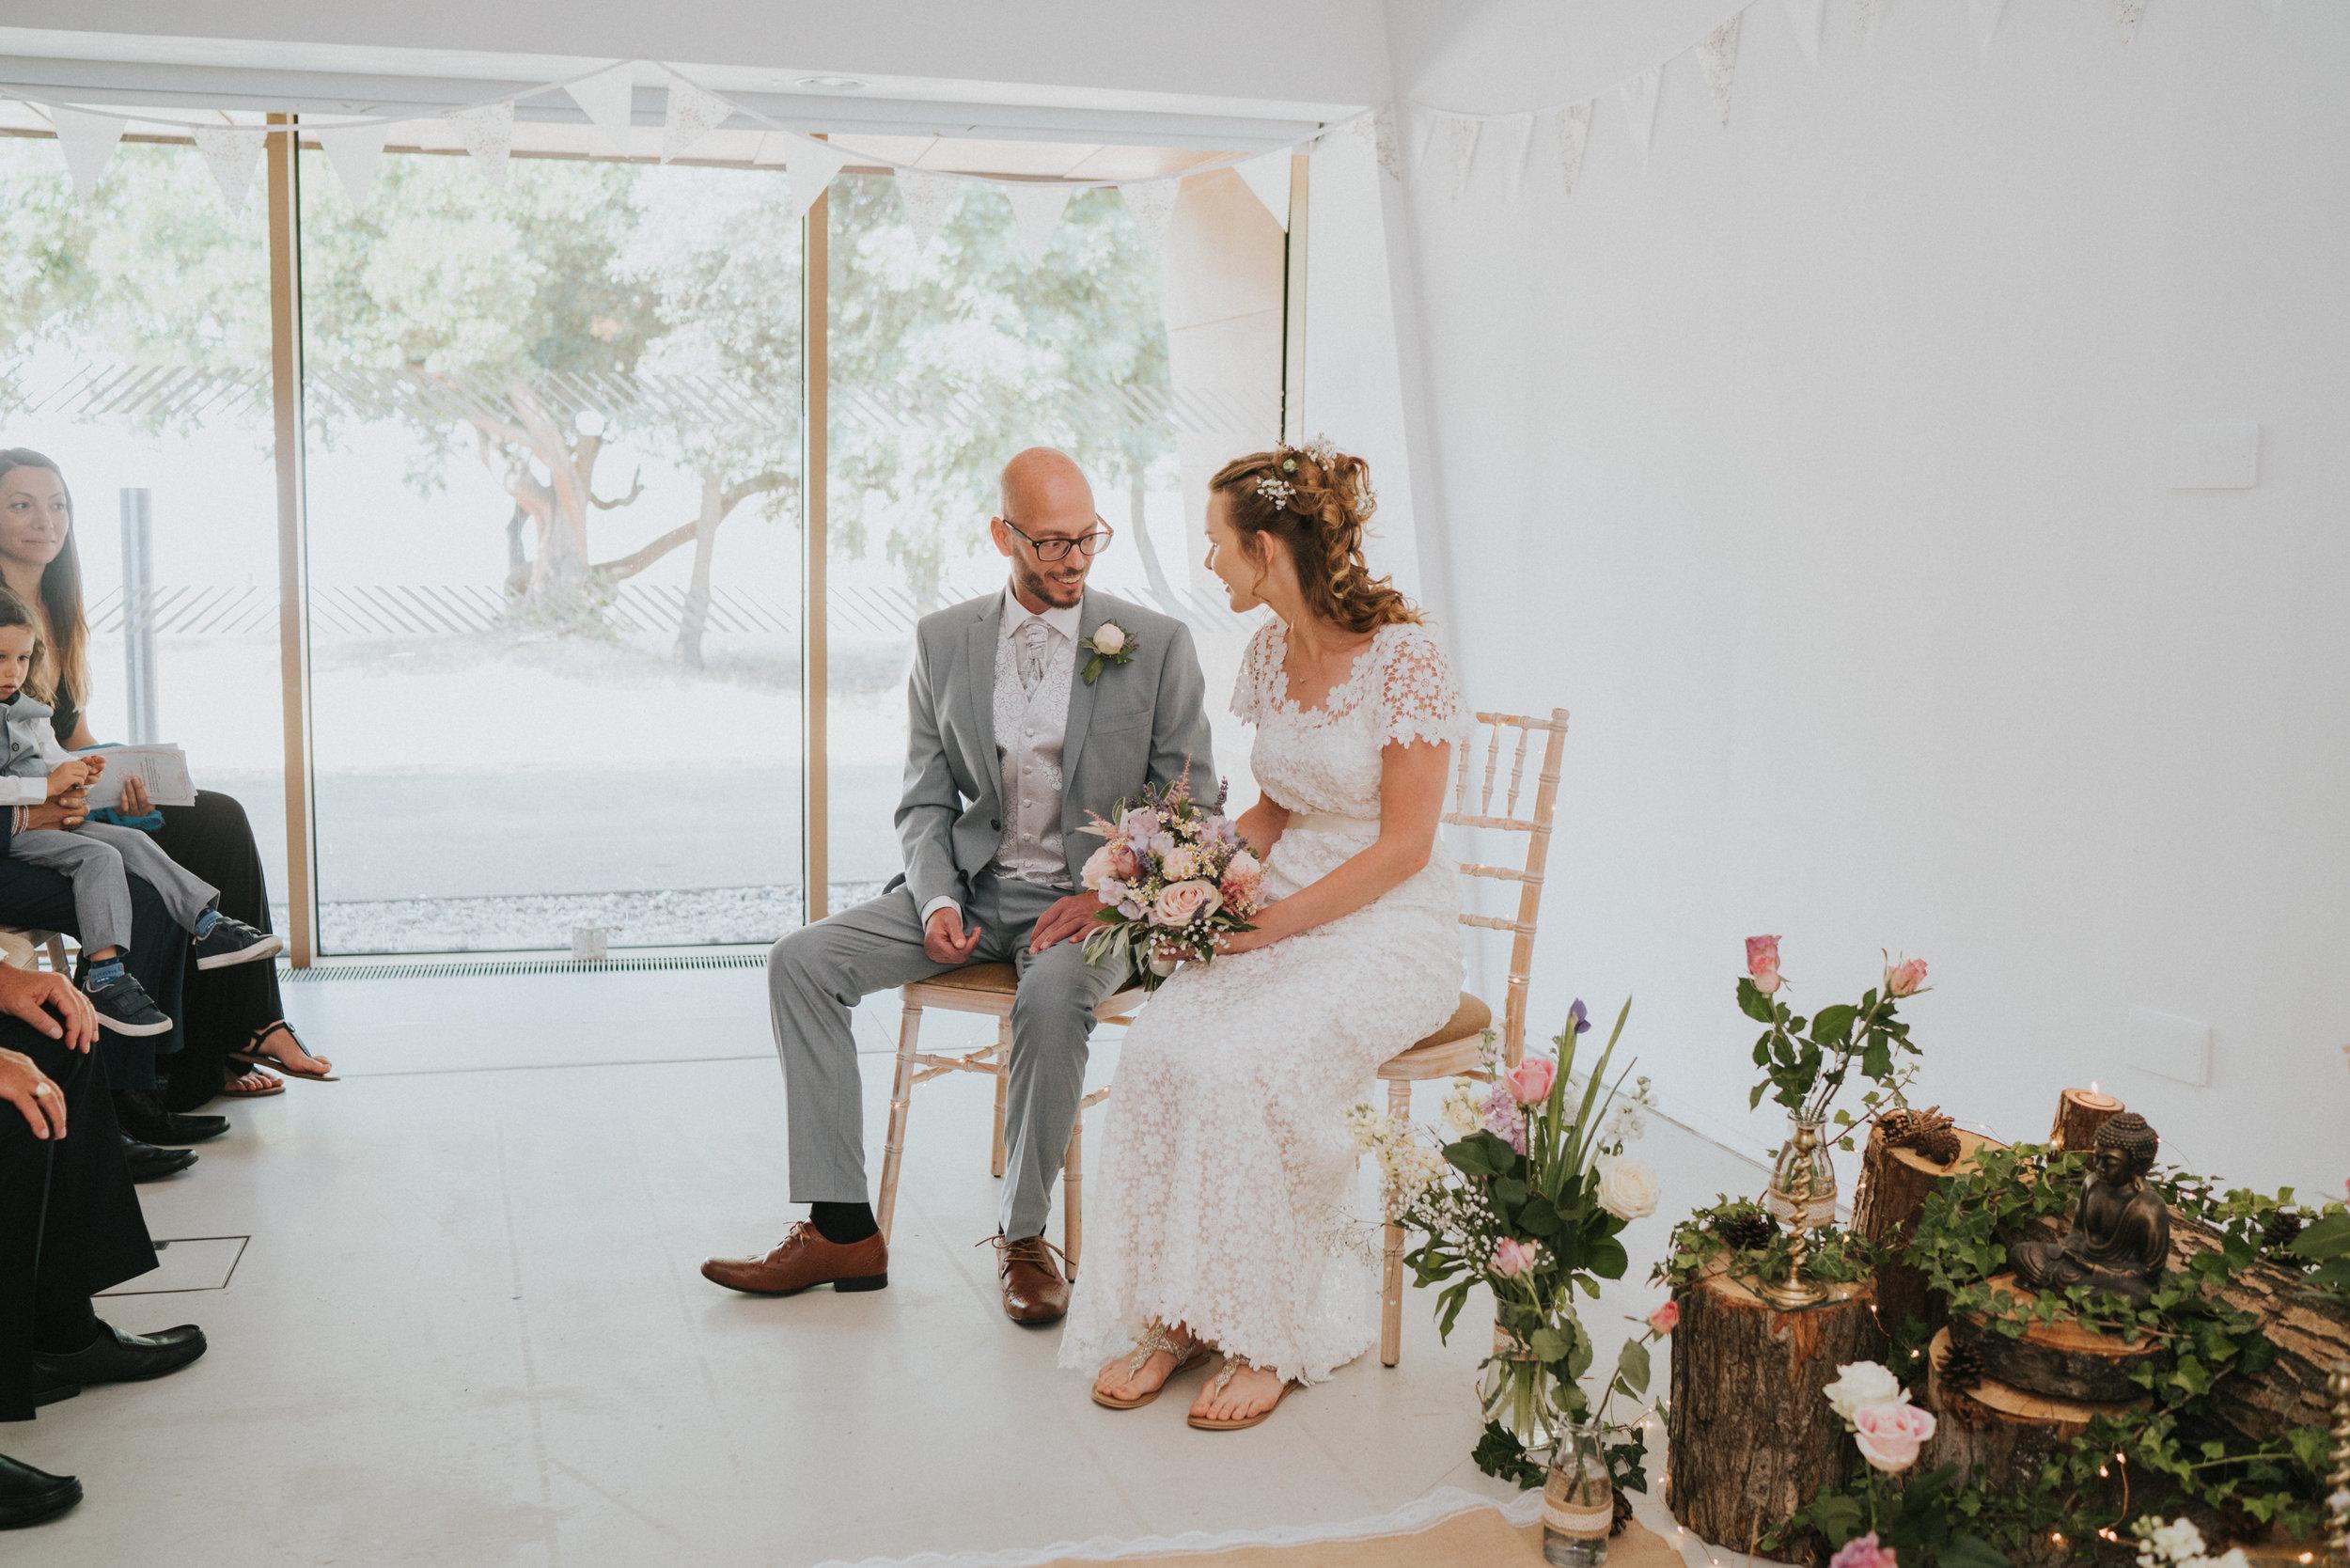 Grace-Elizabeth-Georgie-Amalaketu-Firstsite-Colchester-Essex-Boho-Buddhist-Wedding-Alternative-Wedding-Photography-Essex (43 of 100).jpg